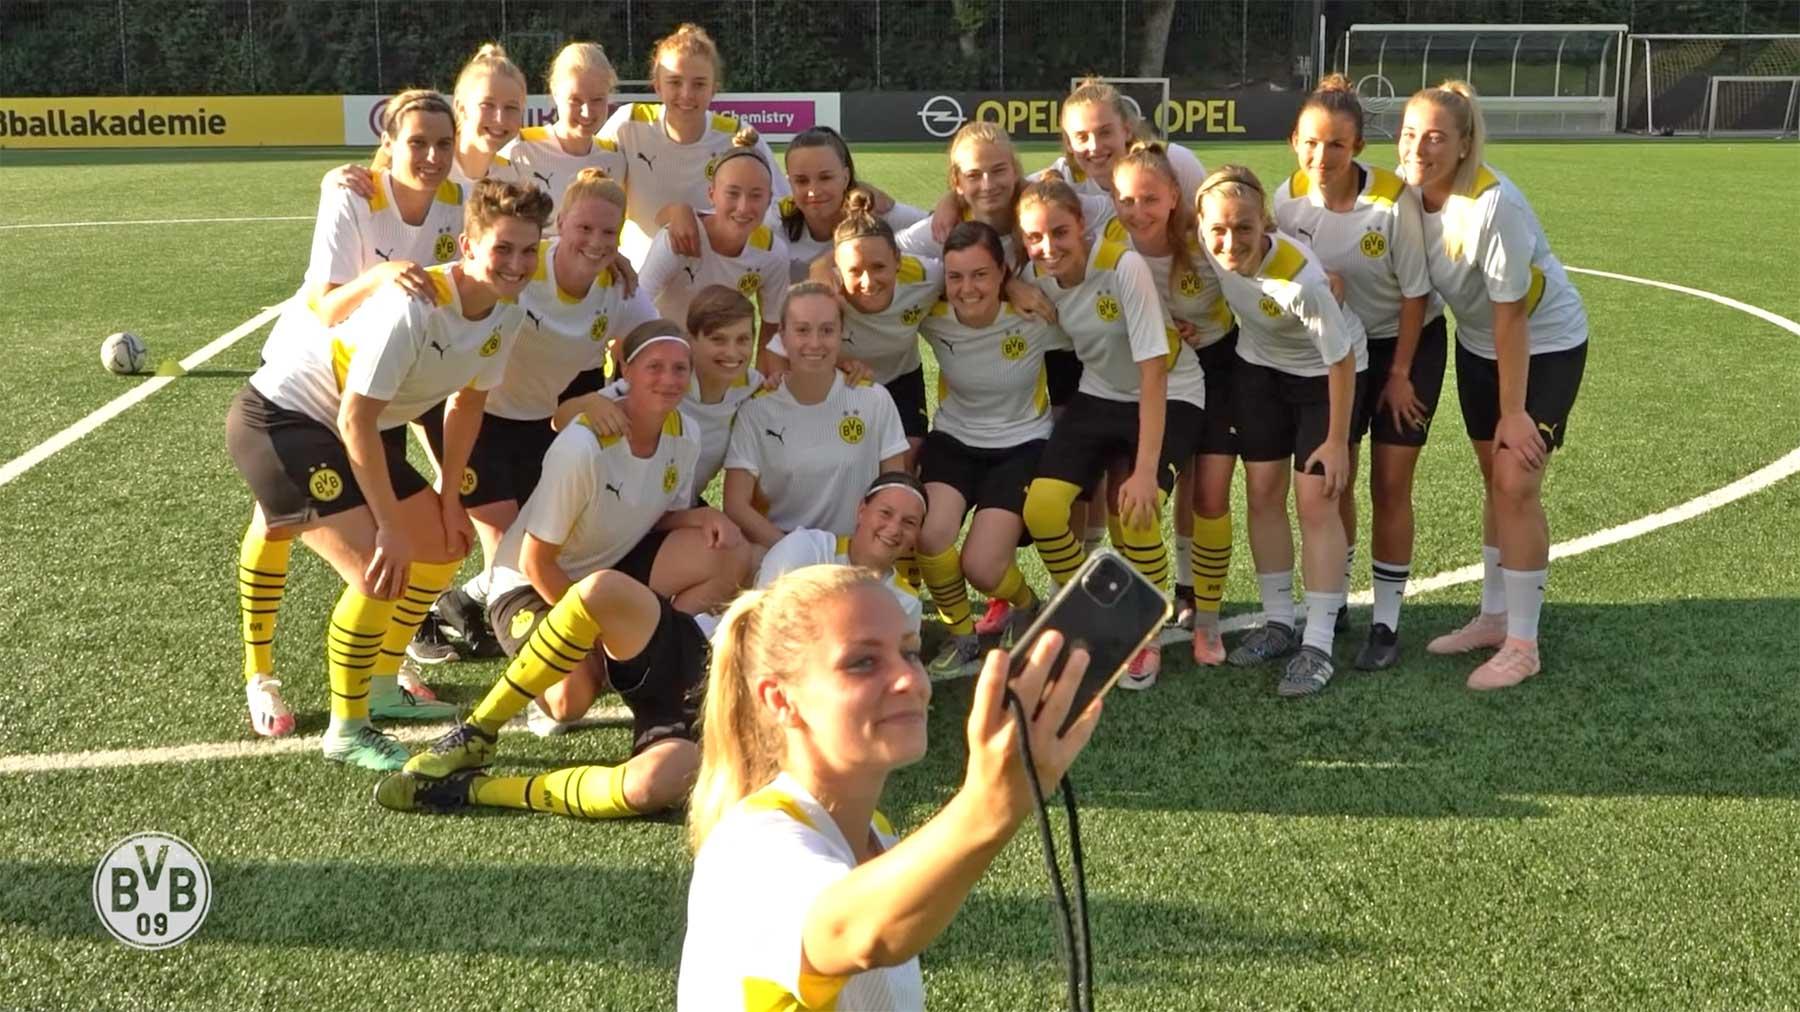 Dokumentation zum Start der BVB-Frauenfußballmannschaft